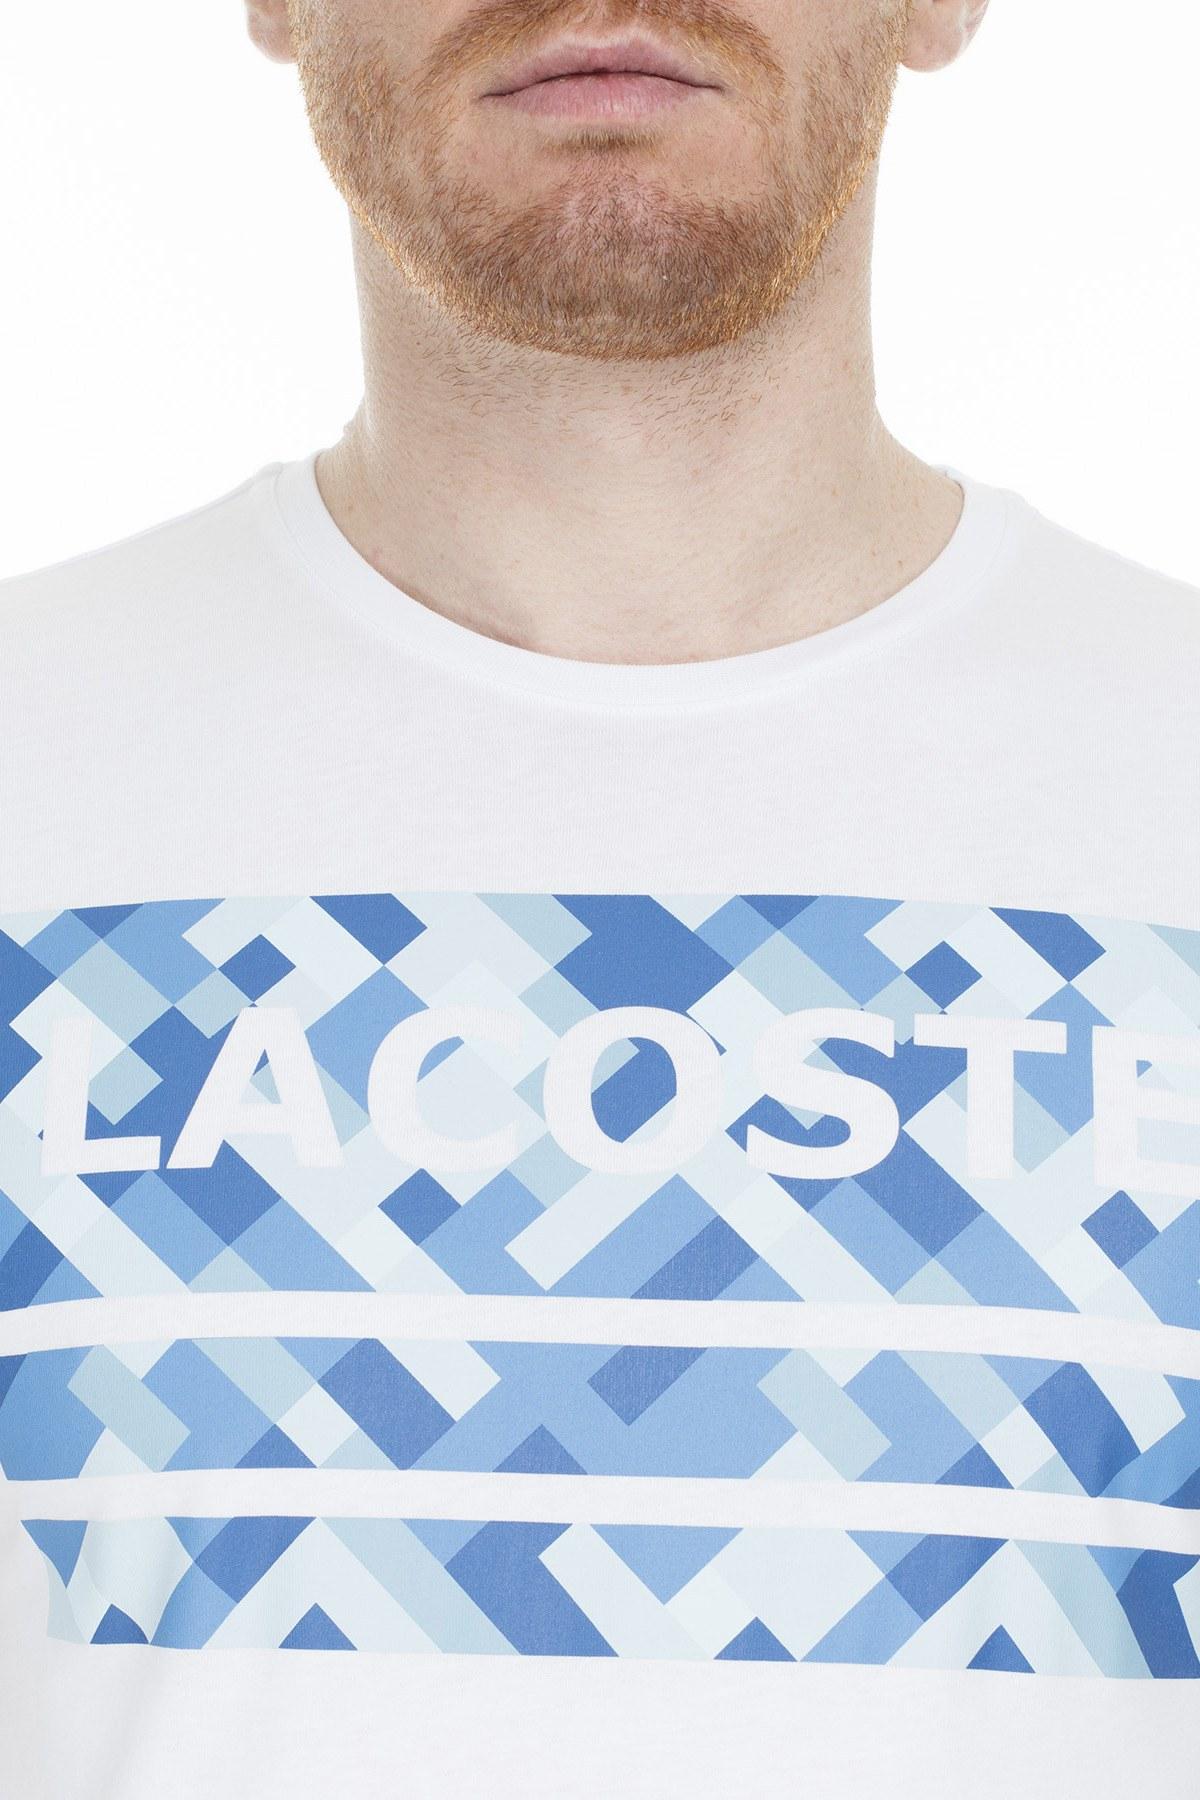 Lacoste Baskılı Bisiklet Yaka Erkek T Shirt TH0020 20A BEYAZ